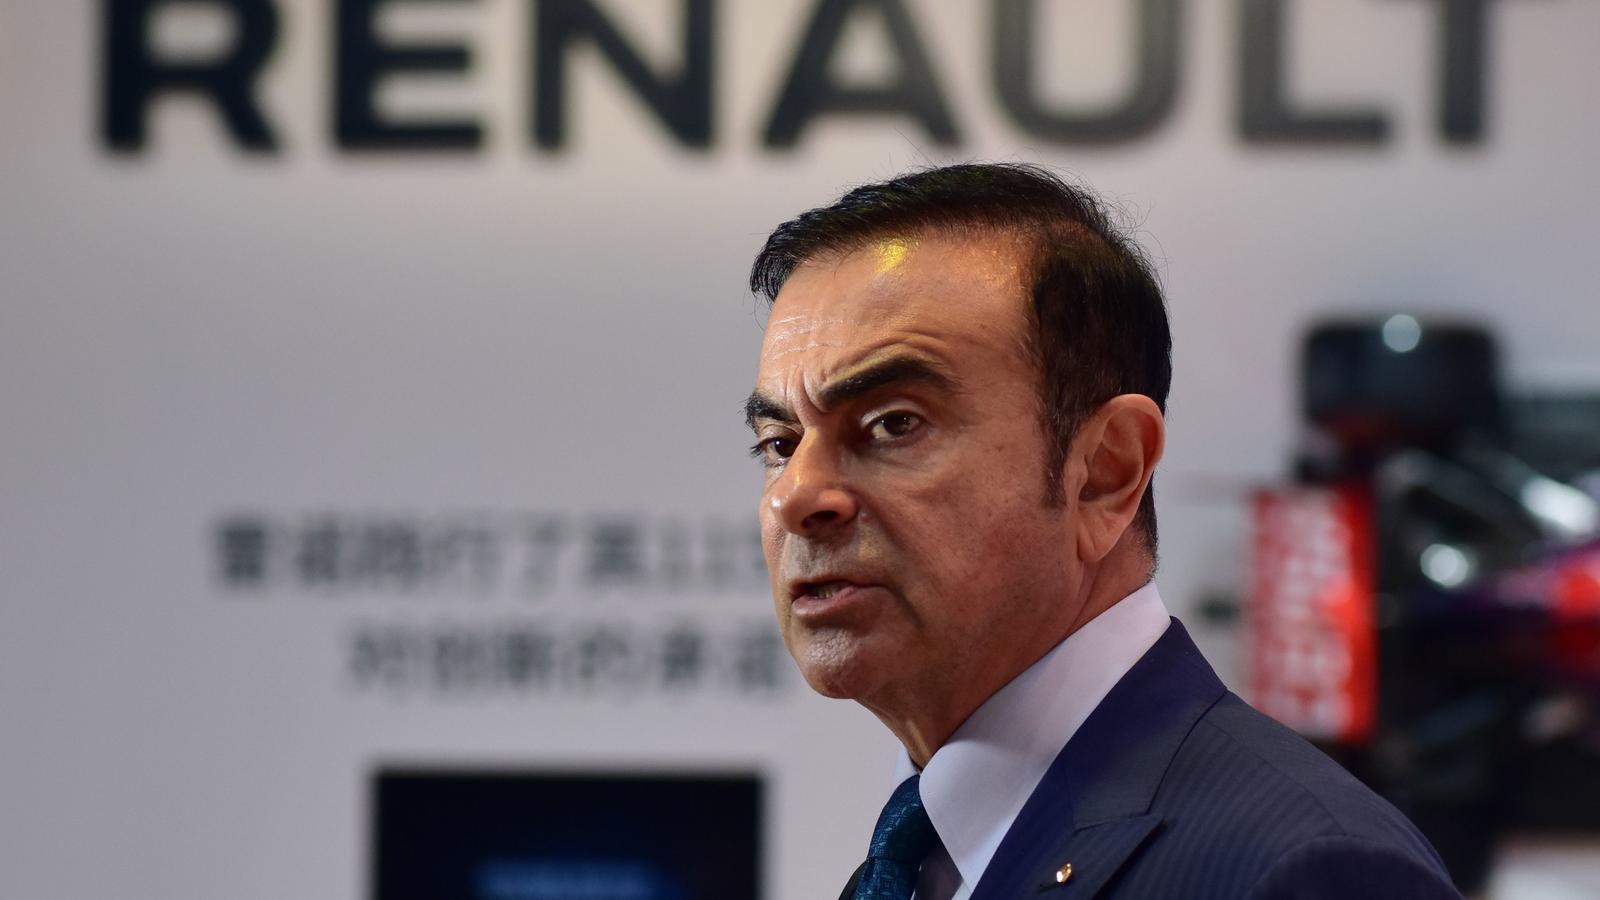 Carlos Ghosn: L'assassí de costos que va ressucitar Renault i Nissan